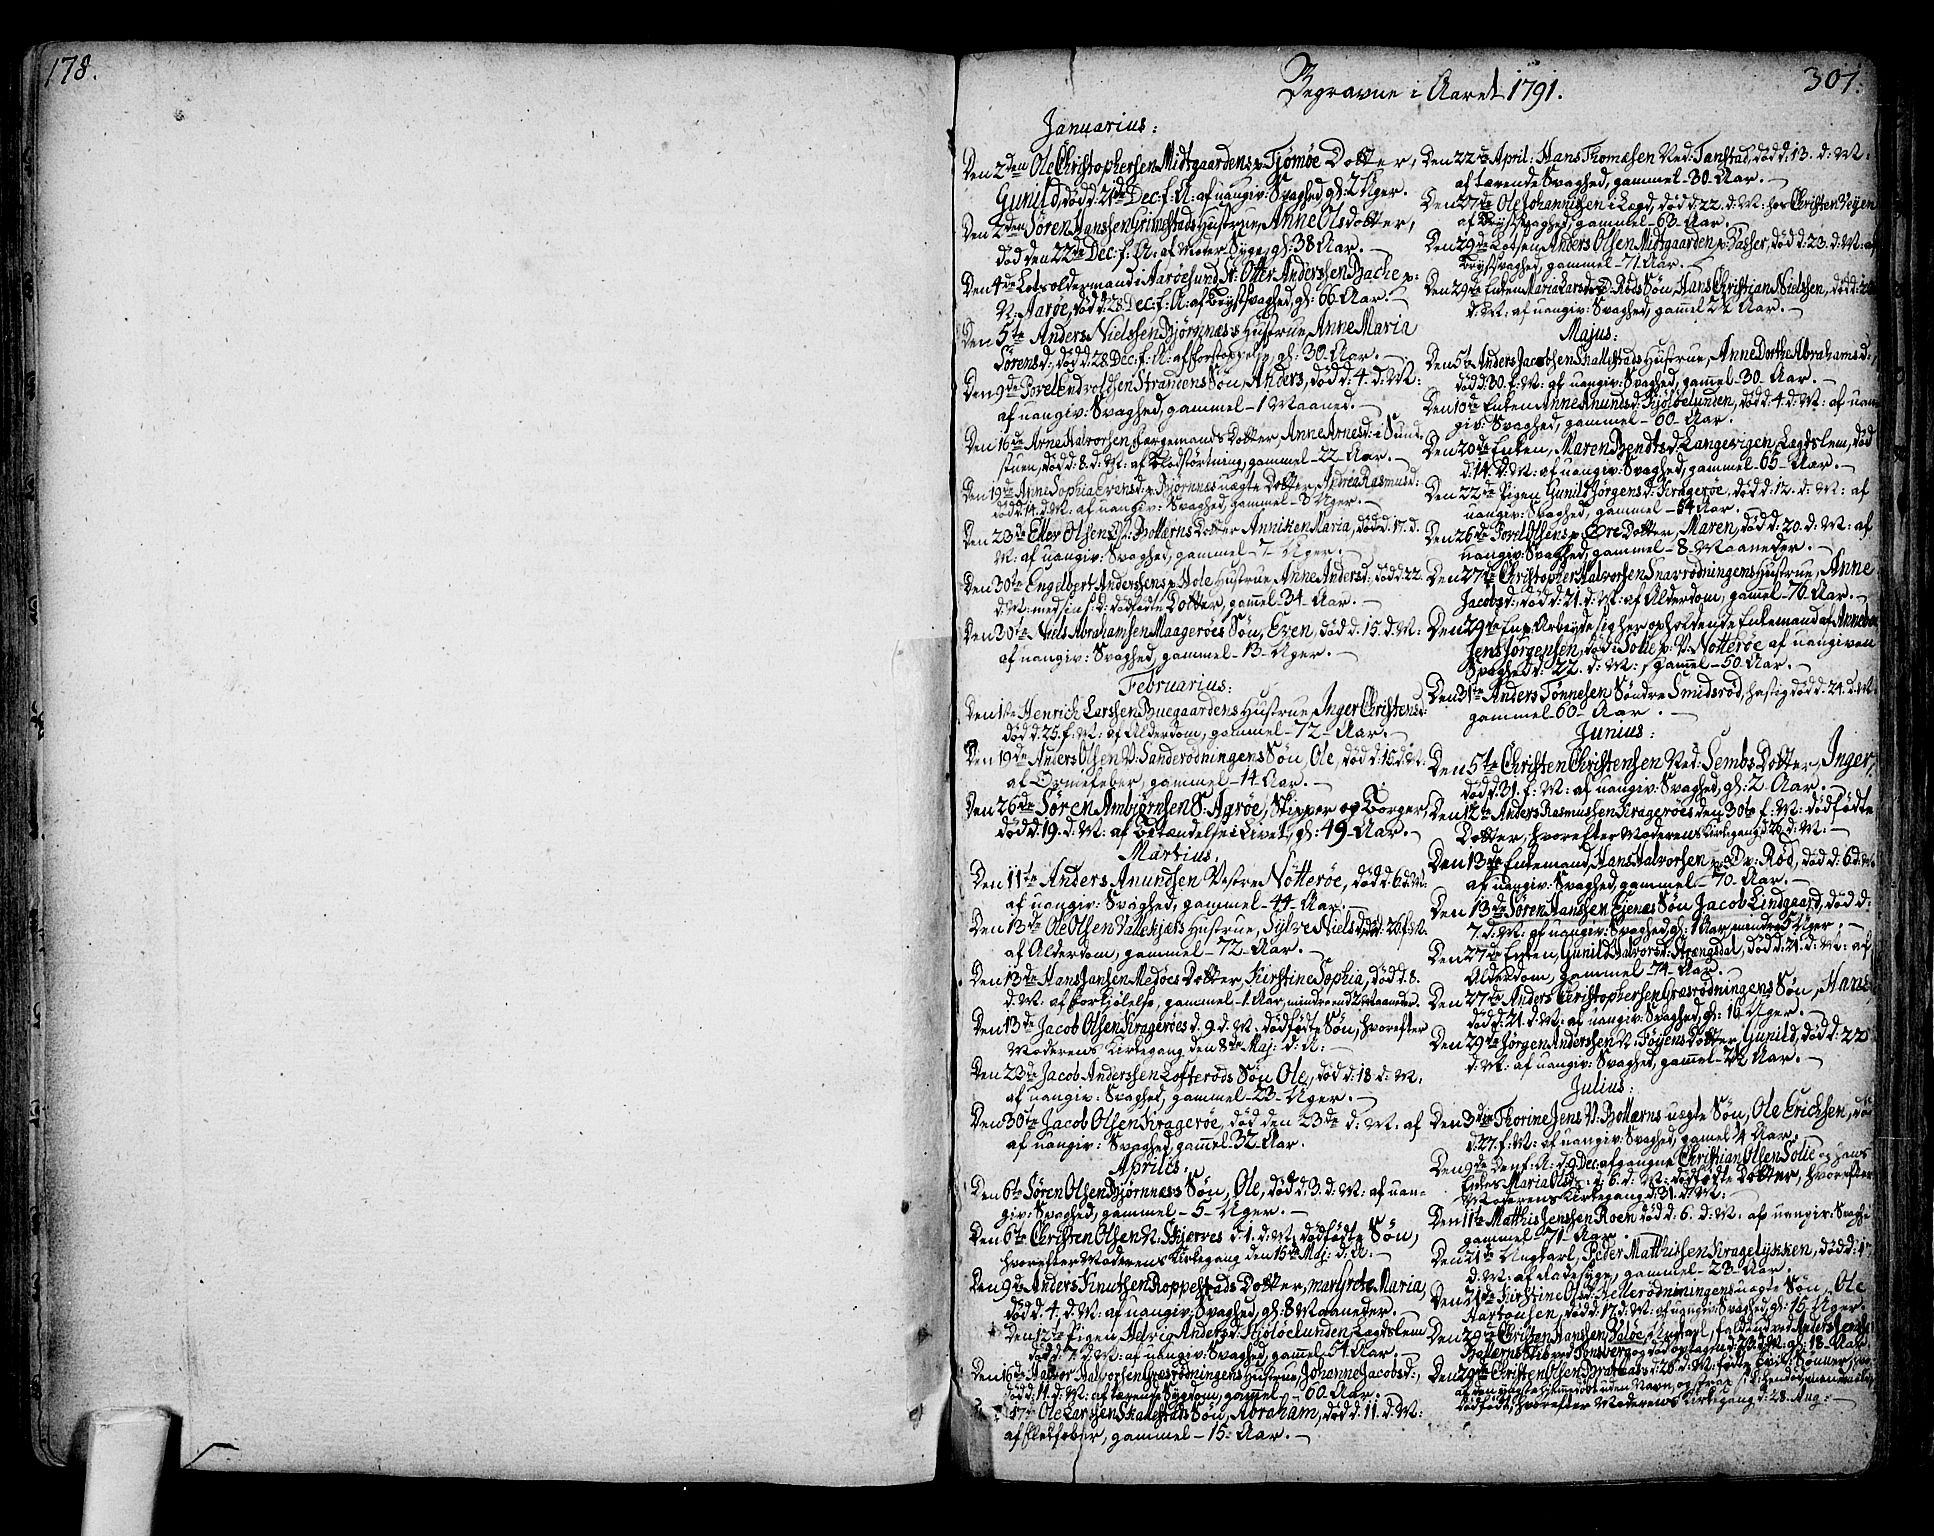 SAKO, Nøtterøy kirkebøker, F/Fa/L0003: Ministerialbok nr. I 3, 1791-1814, s. 300-301